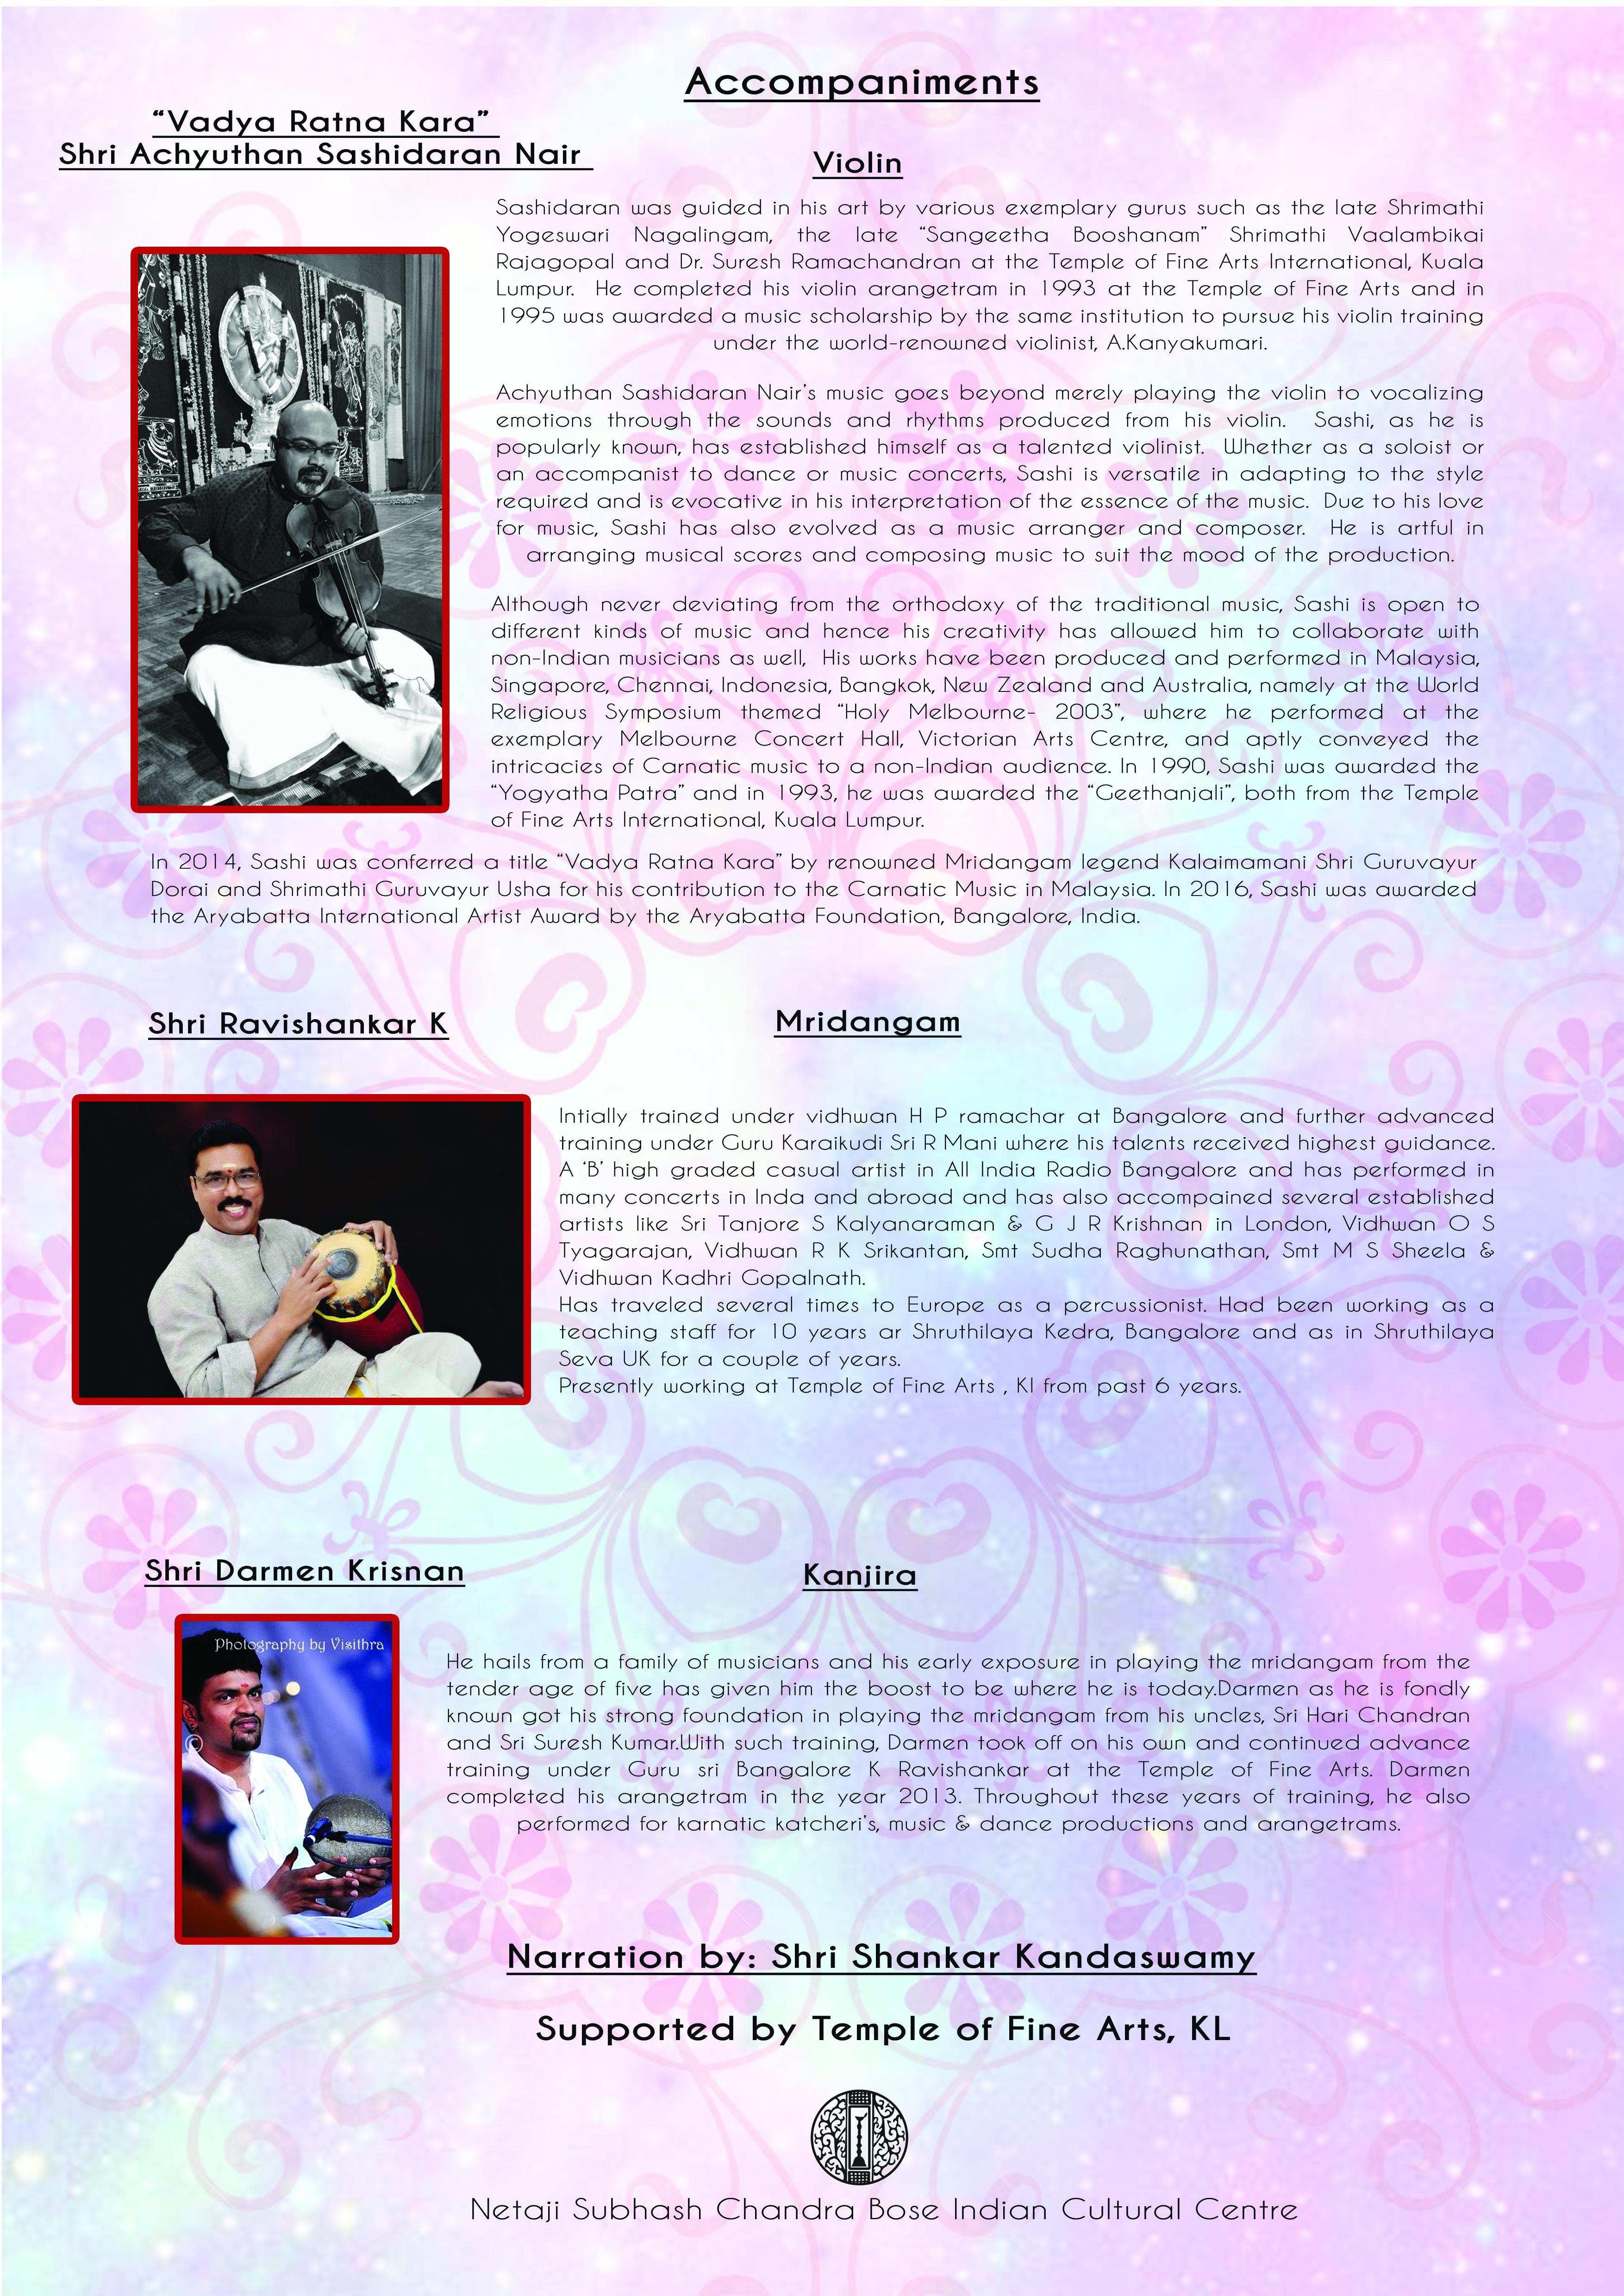 welcome netaji subhash chandra bose n cultural centre kuala 22